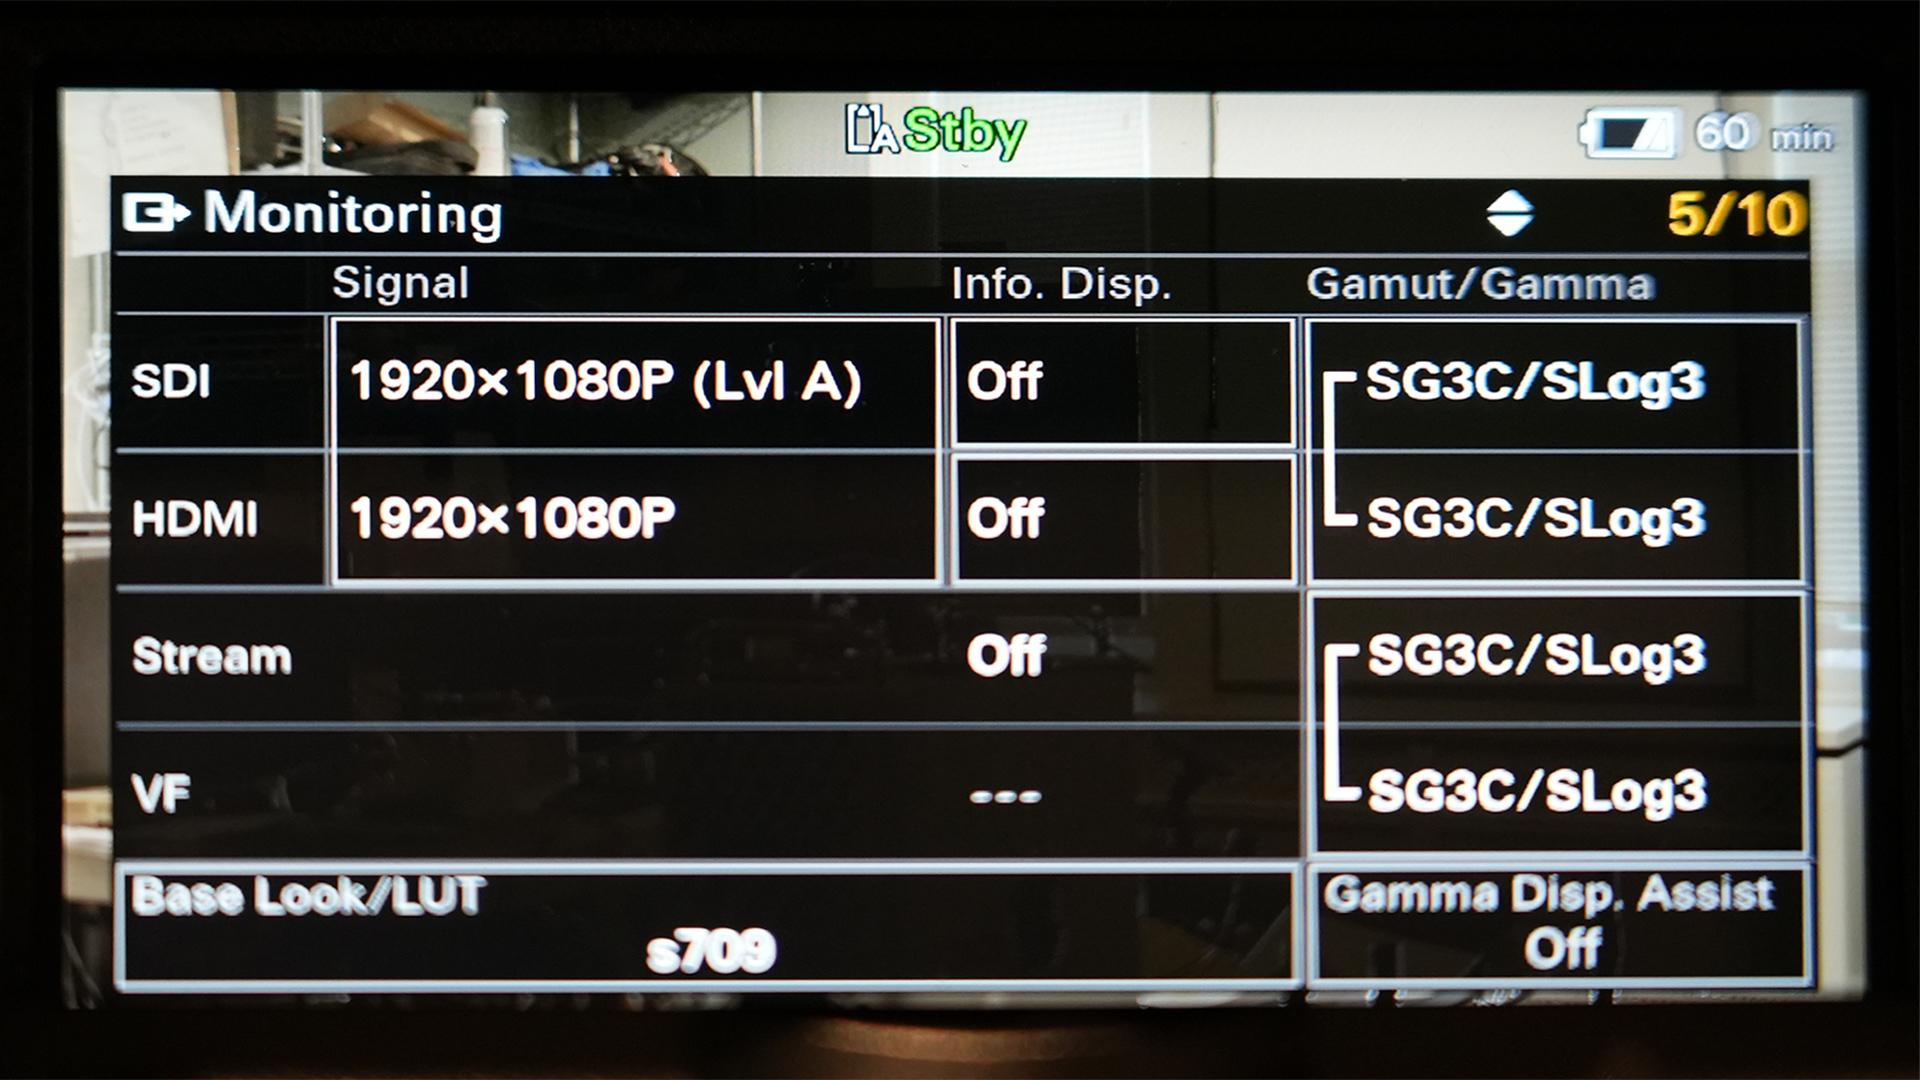 Sony FX6 menu system. Image: Ned Soltz.